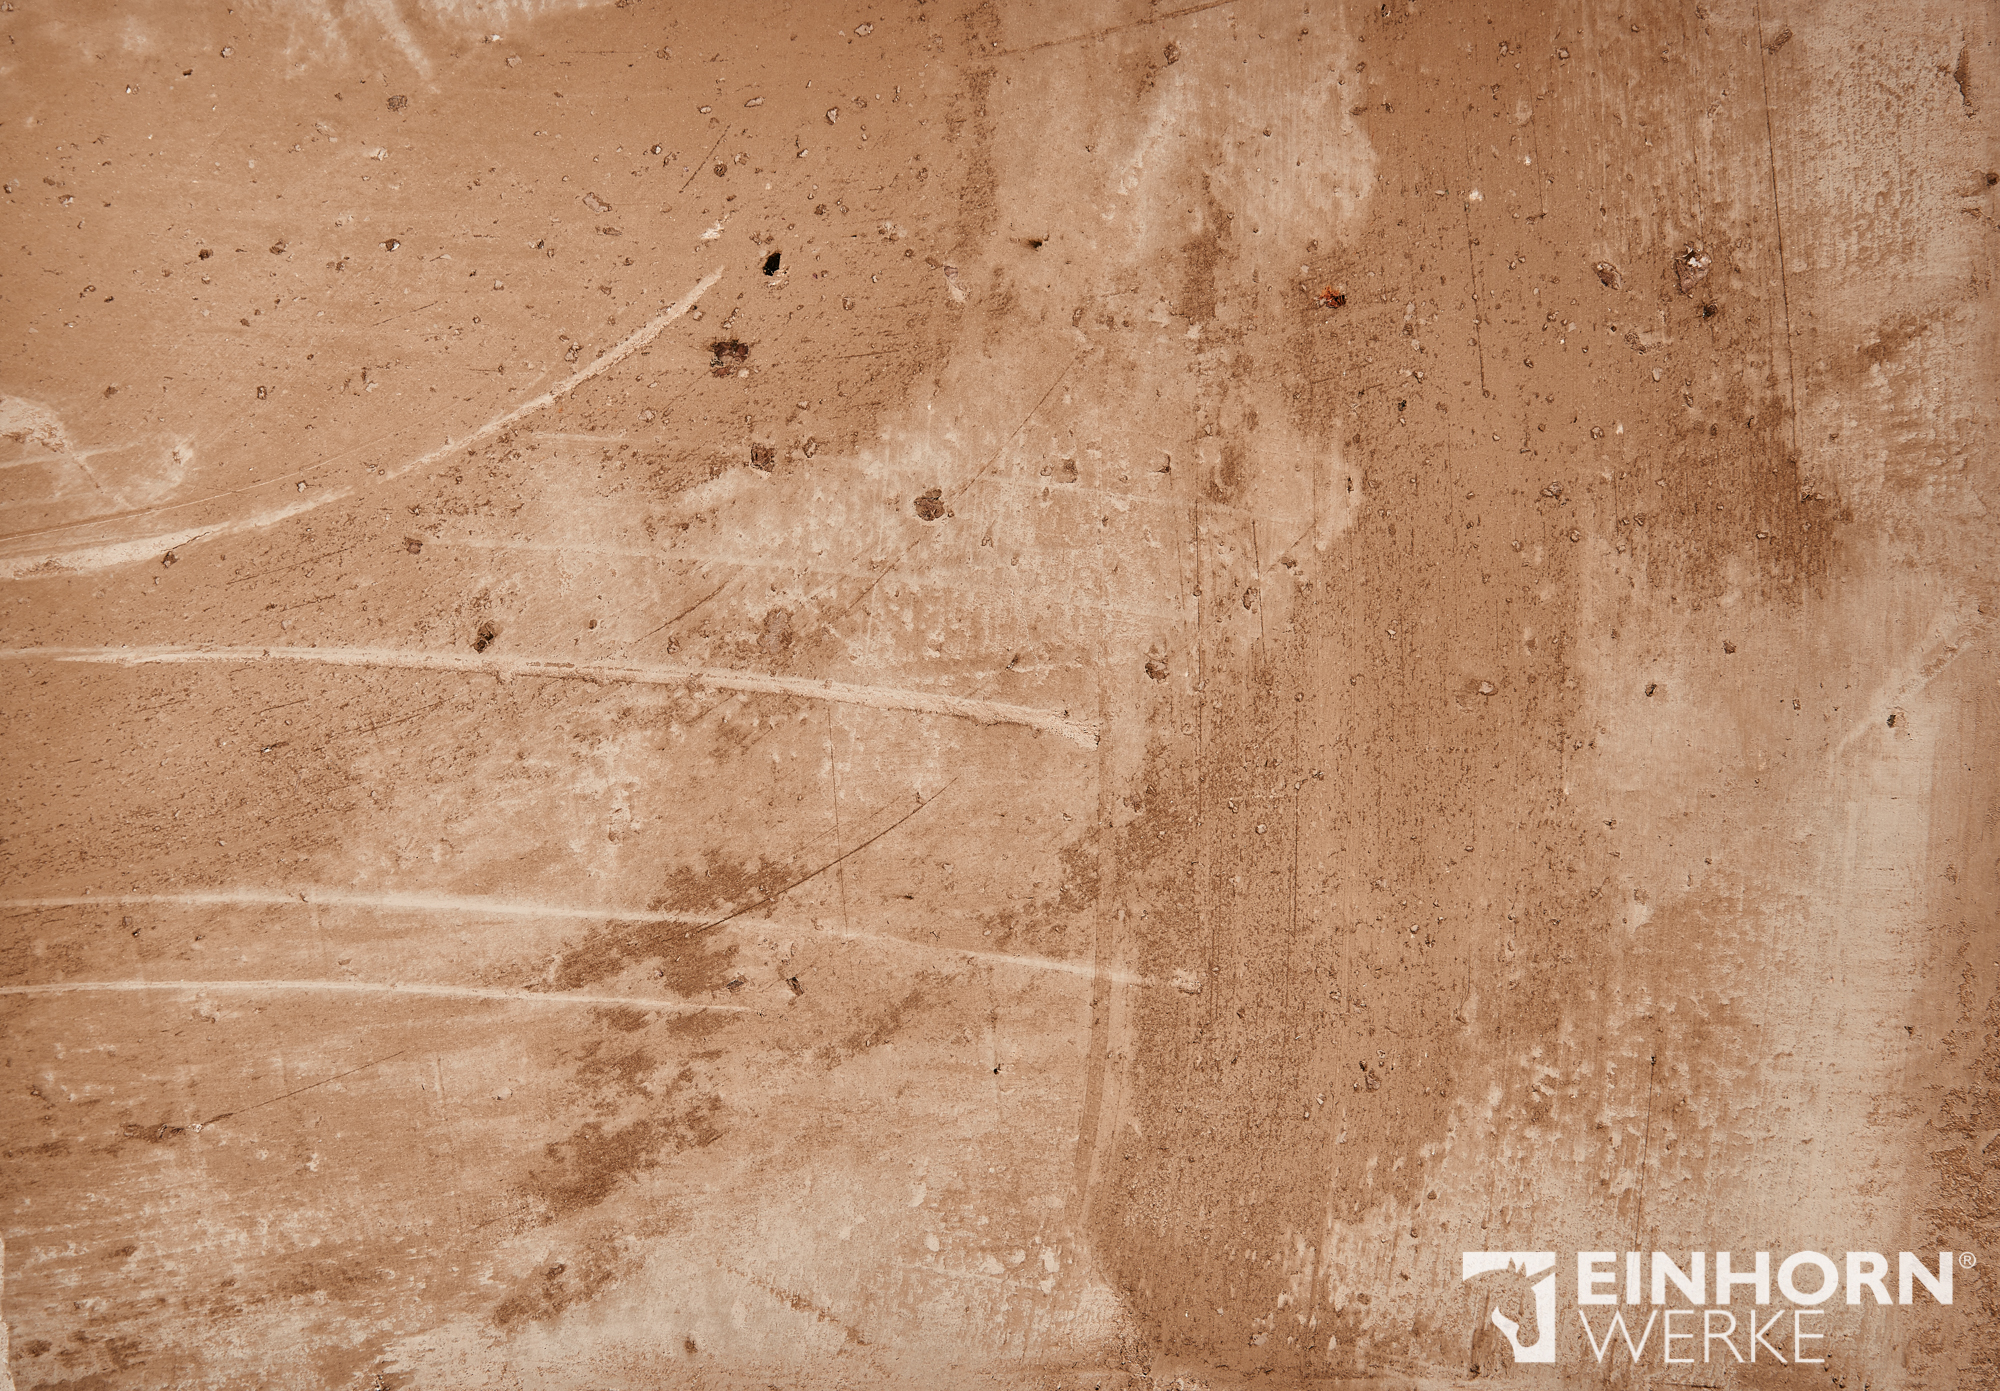 STUCCORINO 0804 + + Perlglimmer grob + STUCCORINO Fresco 0802 + EINHORN WERKE ® Wand- & Bodenöl plus 2